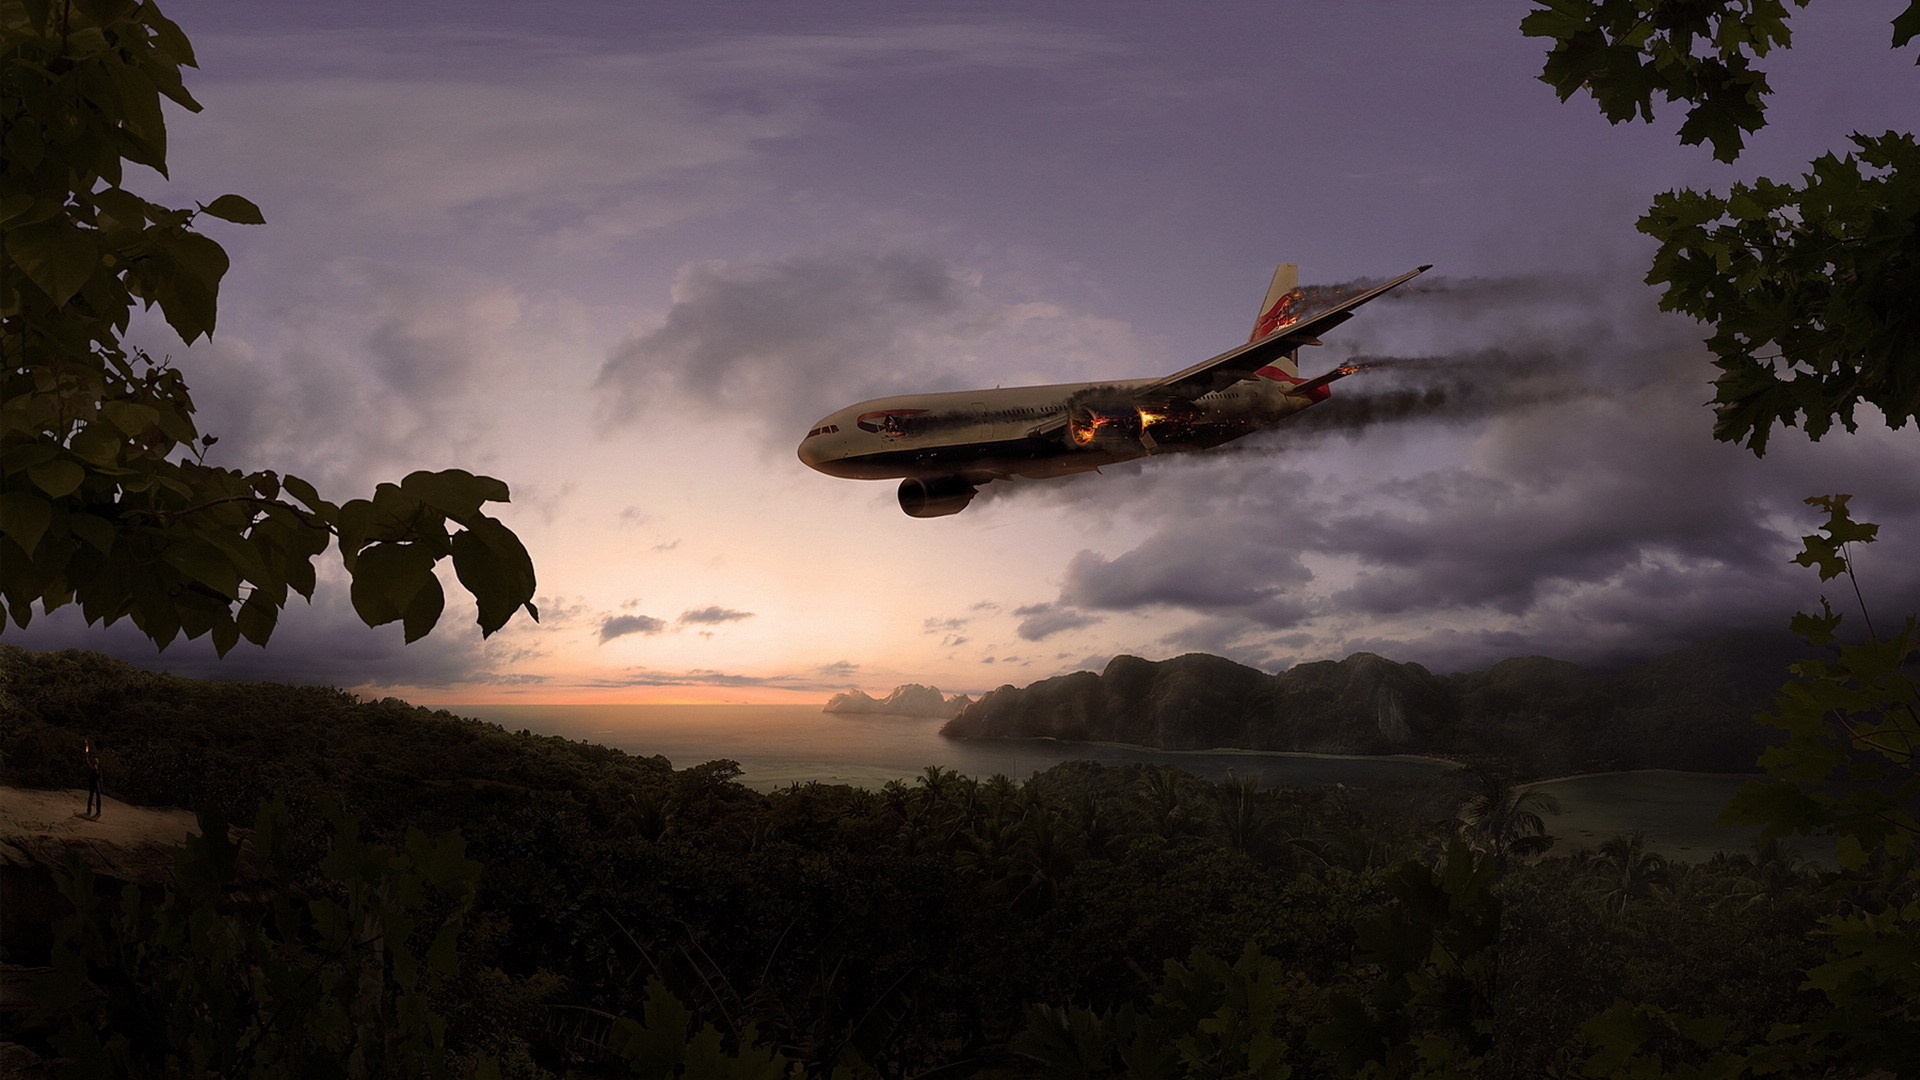 plane island crash wallpapers 1920x1080 1920x1080